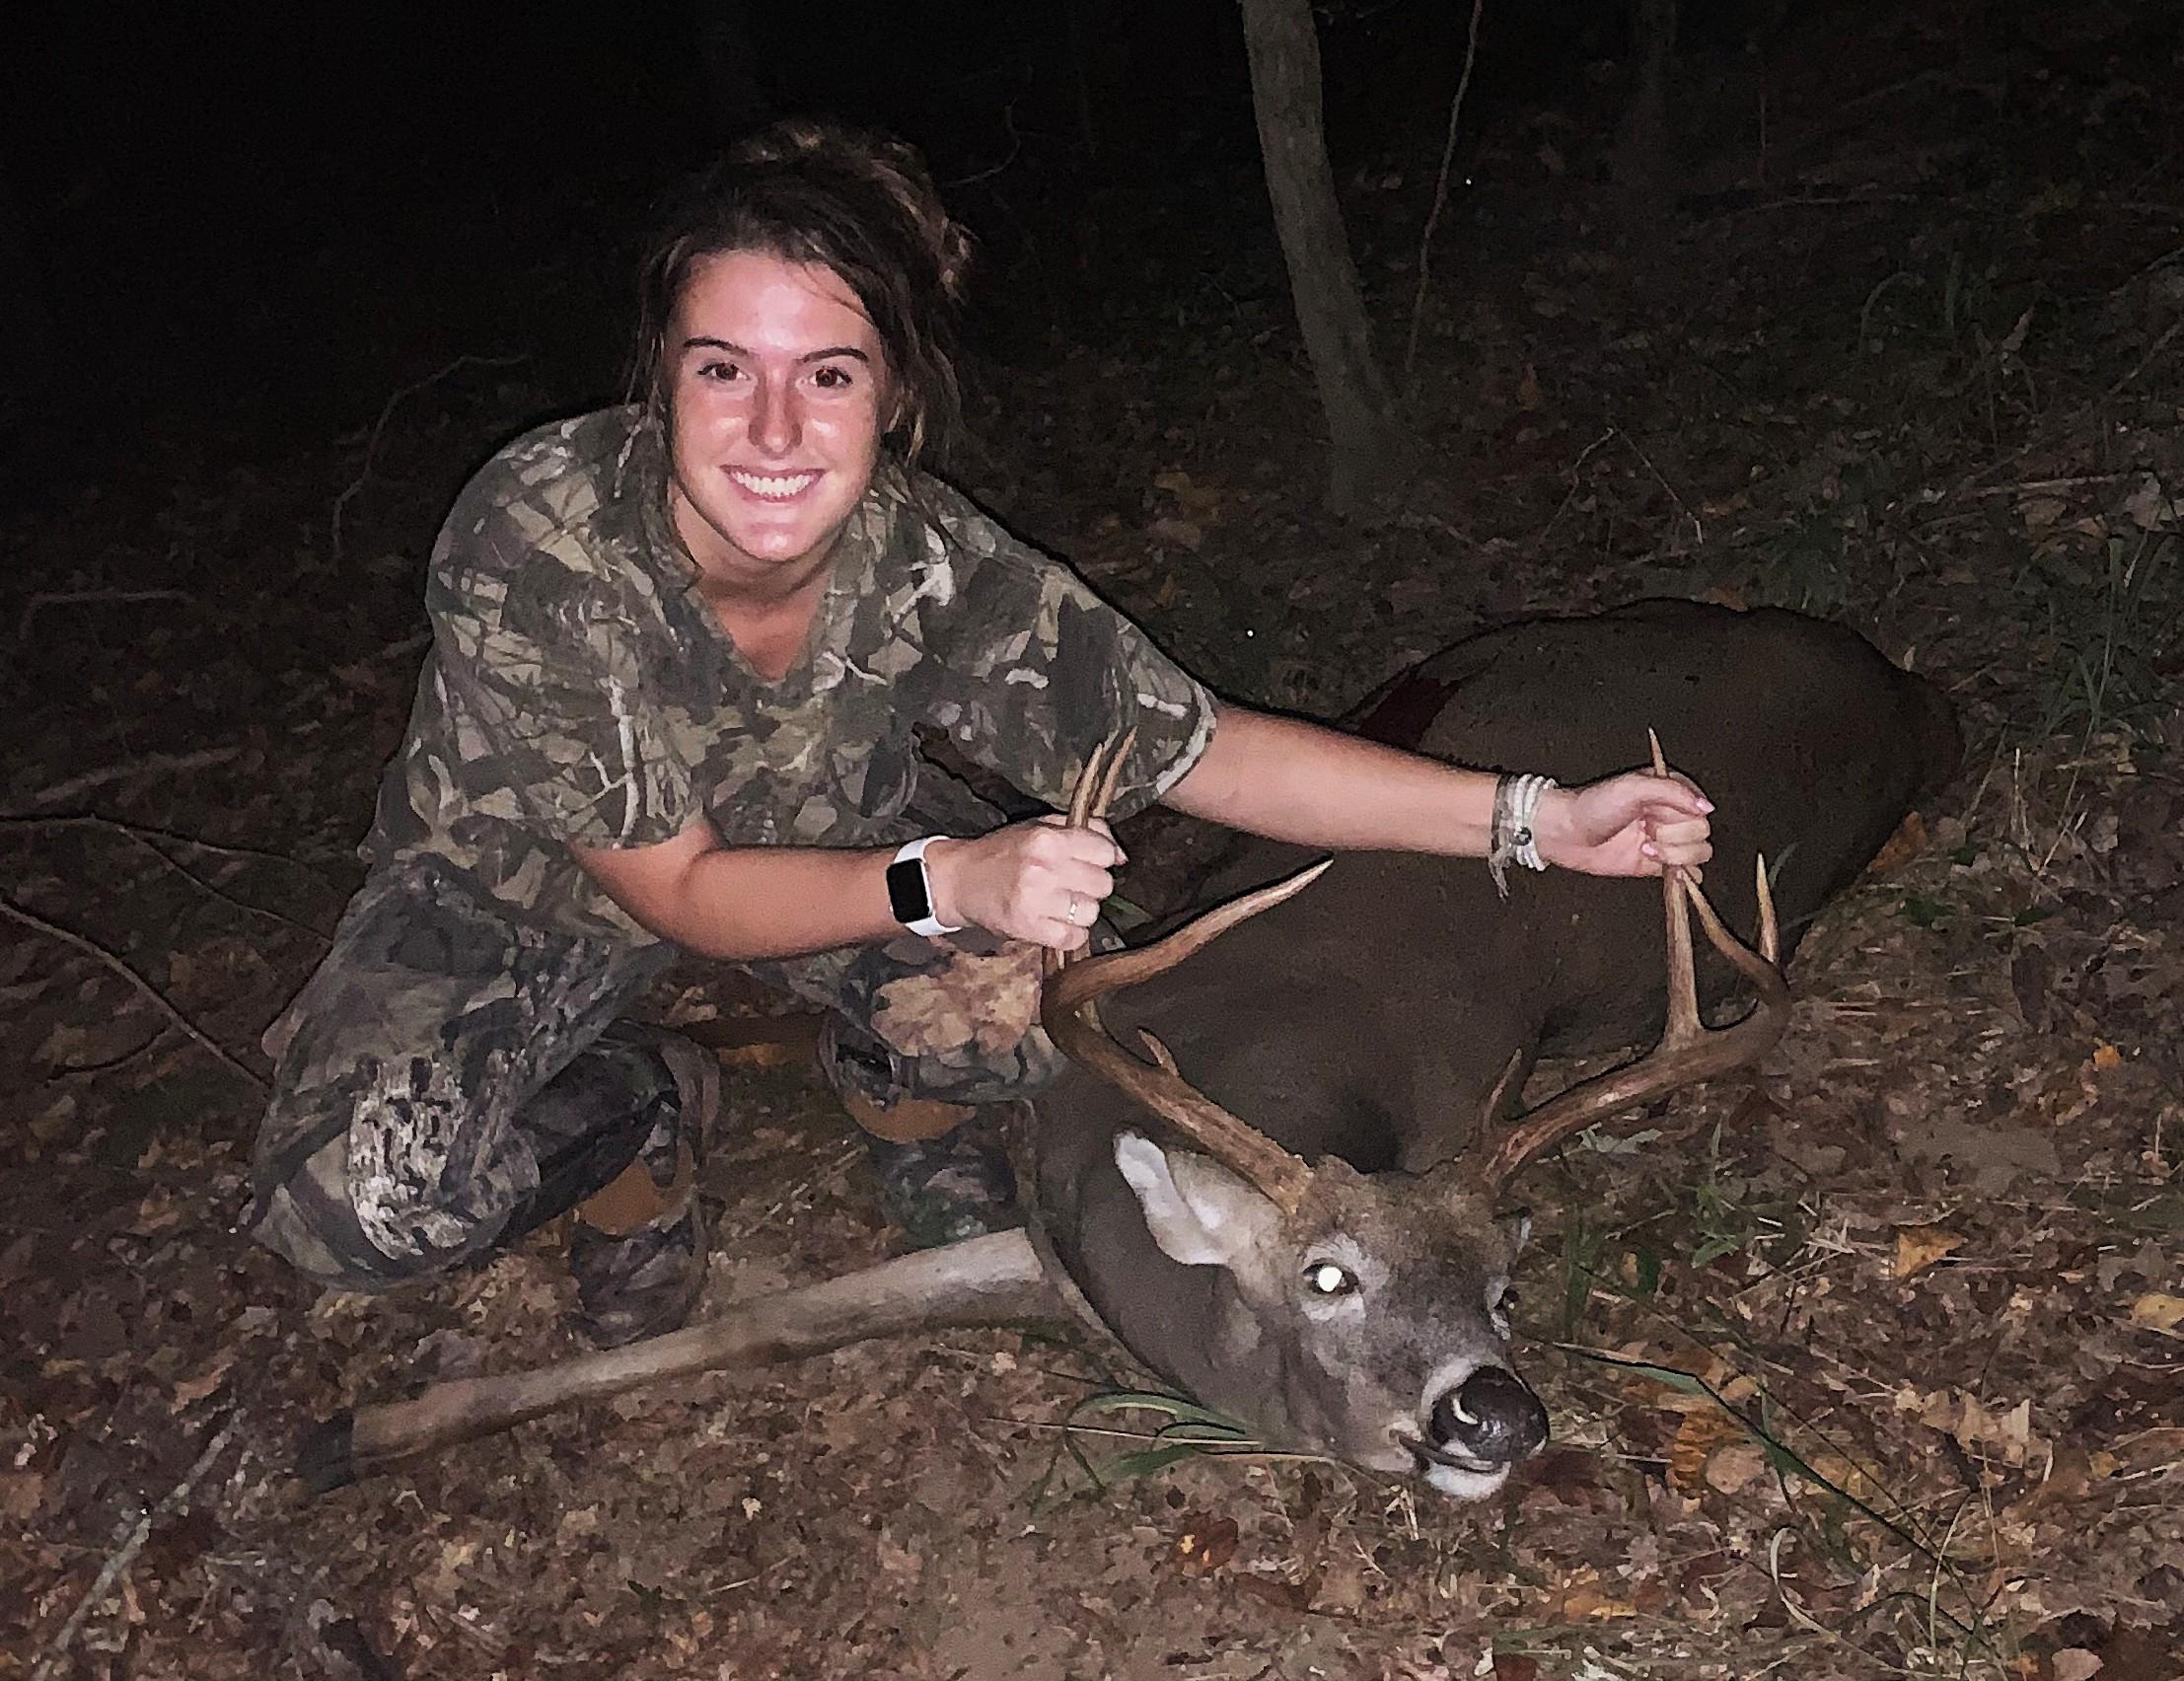 Go Time' In The Georgia Deer Woods  Union County Georgia Deer Rut Date